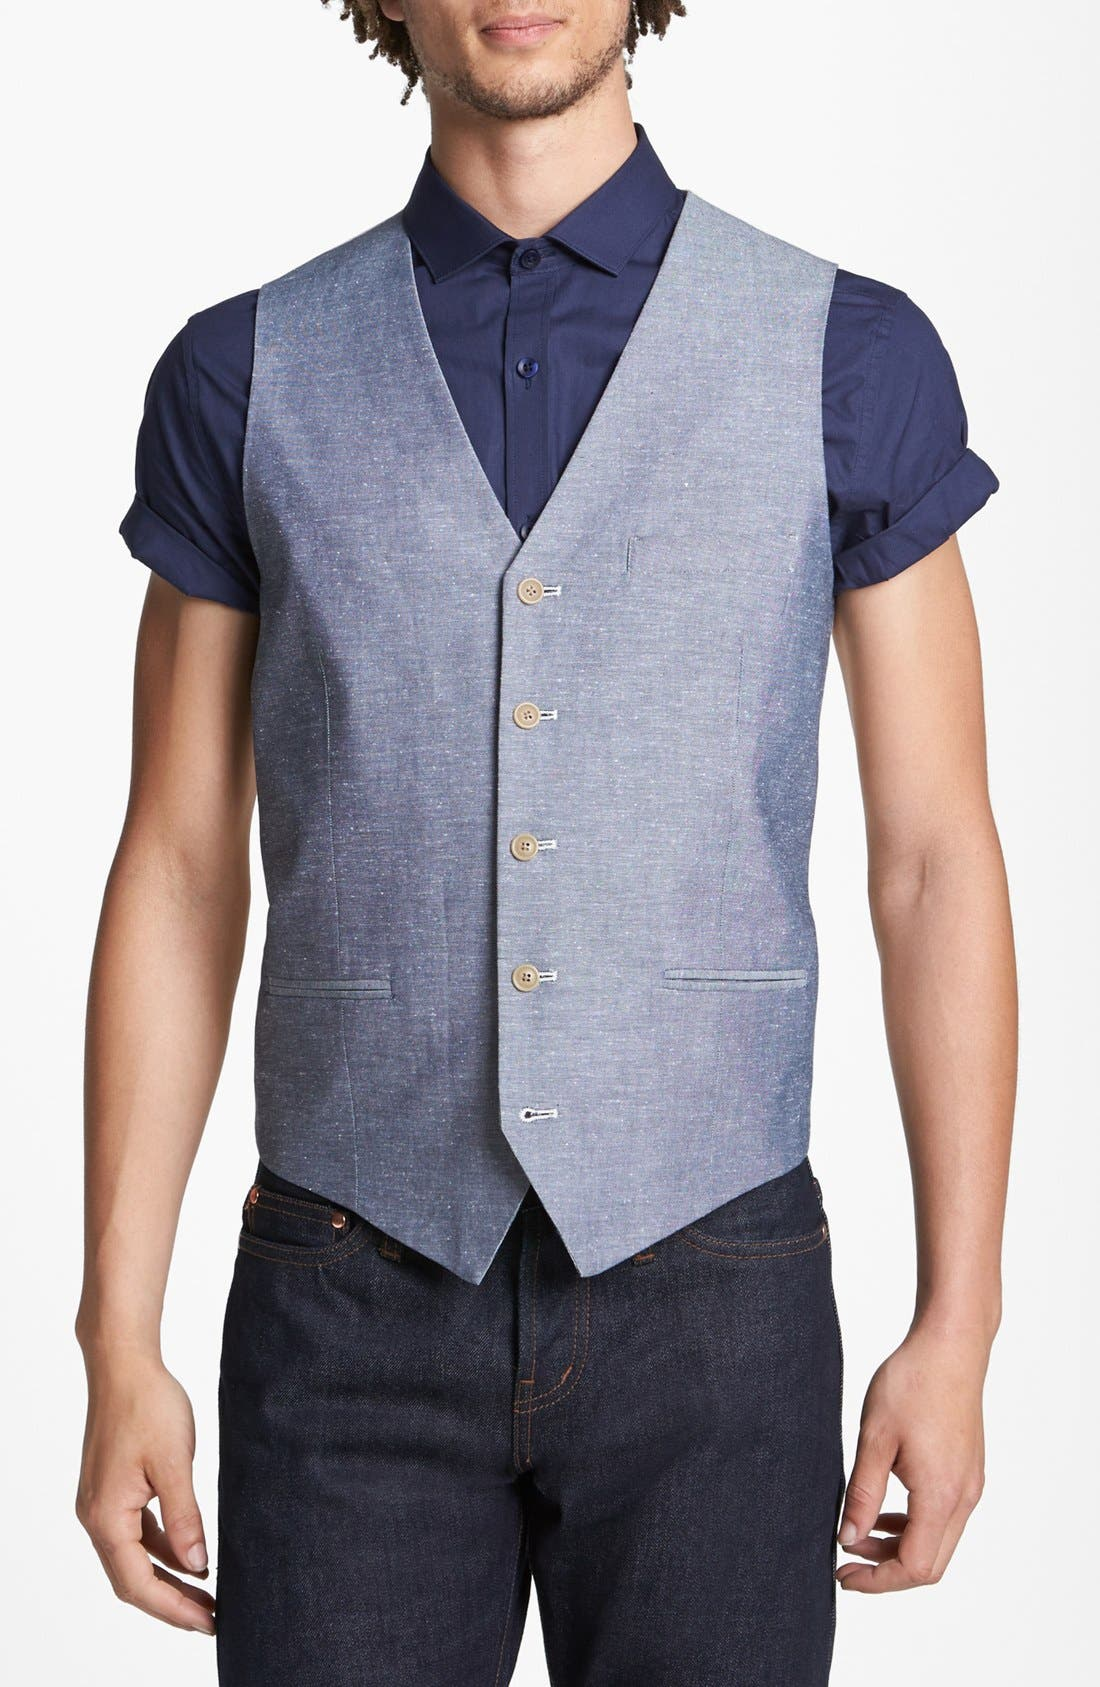 Alternate Image 1 Selected - Topman Trim Fit Oxford Waistcoat